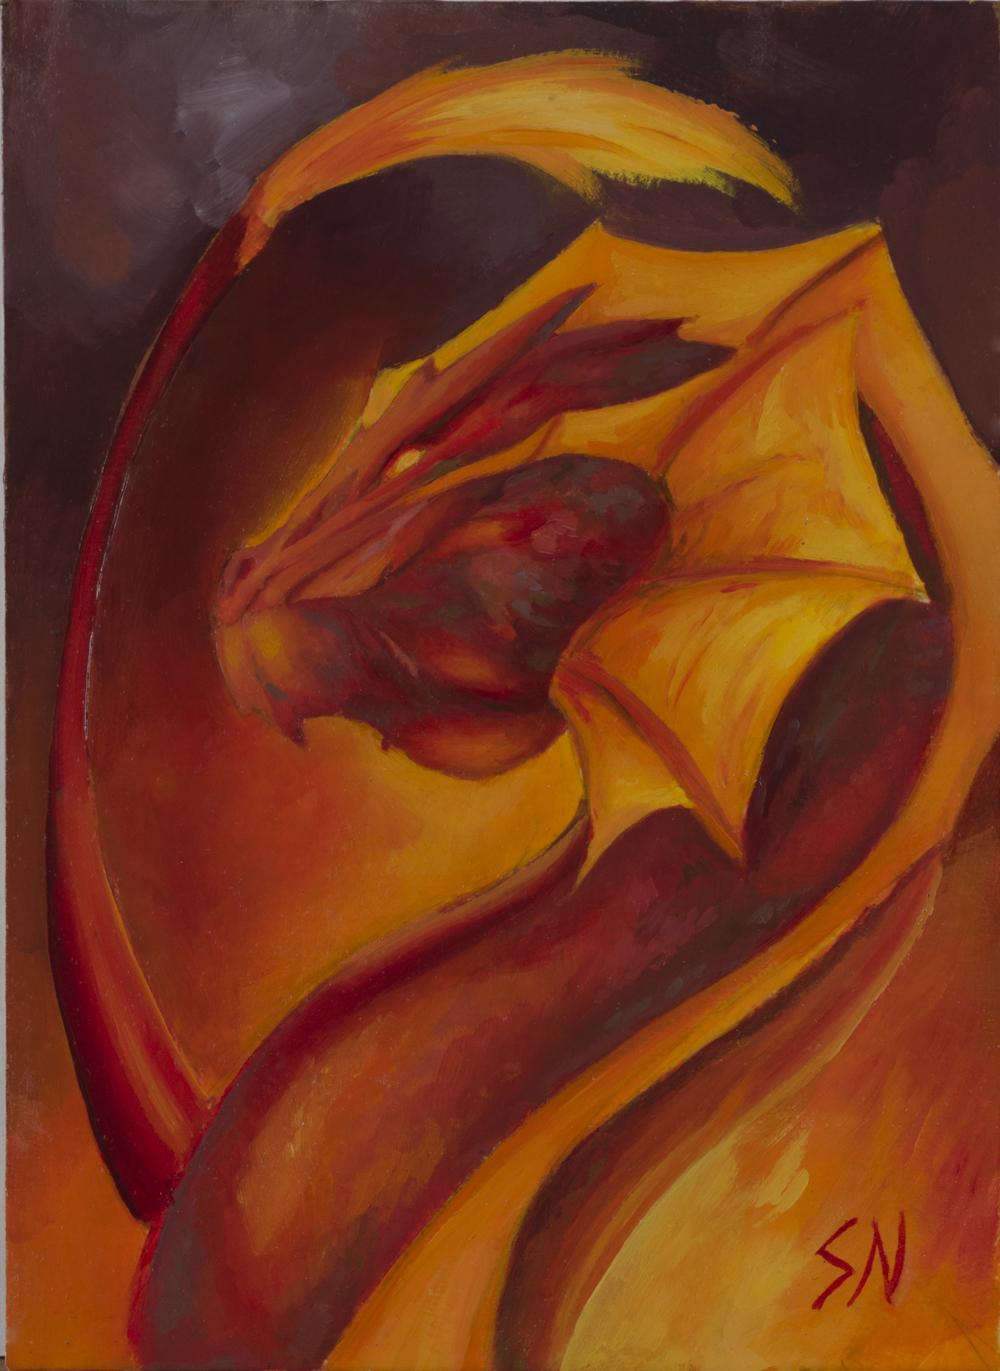 dragon9_StephenNajarian